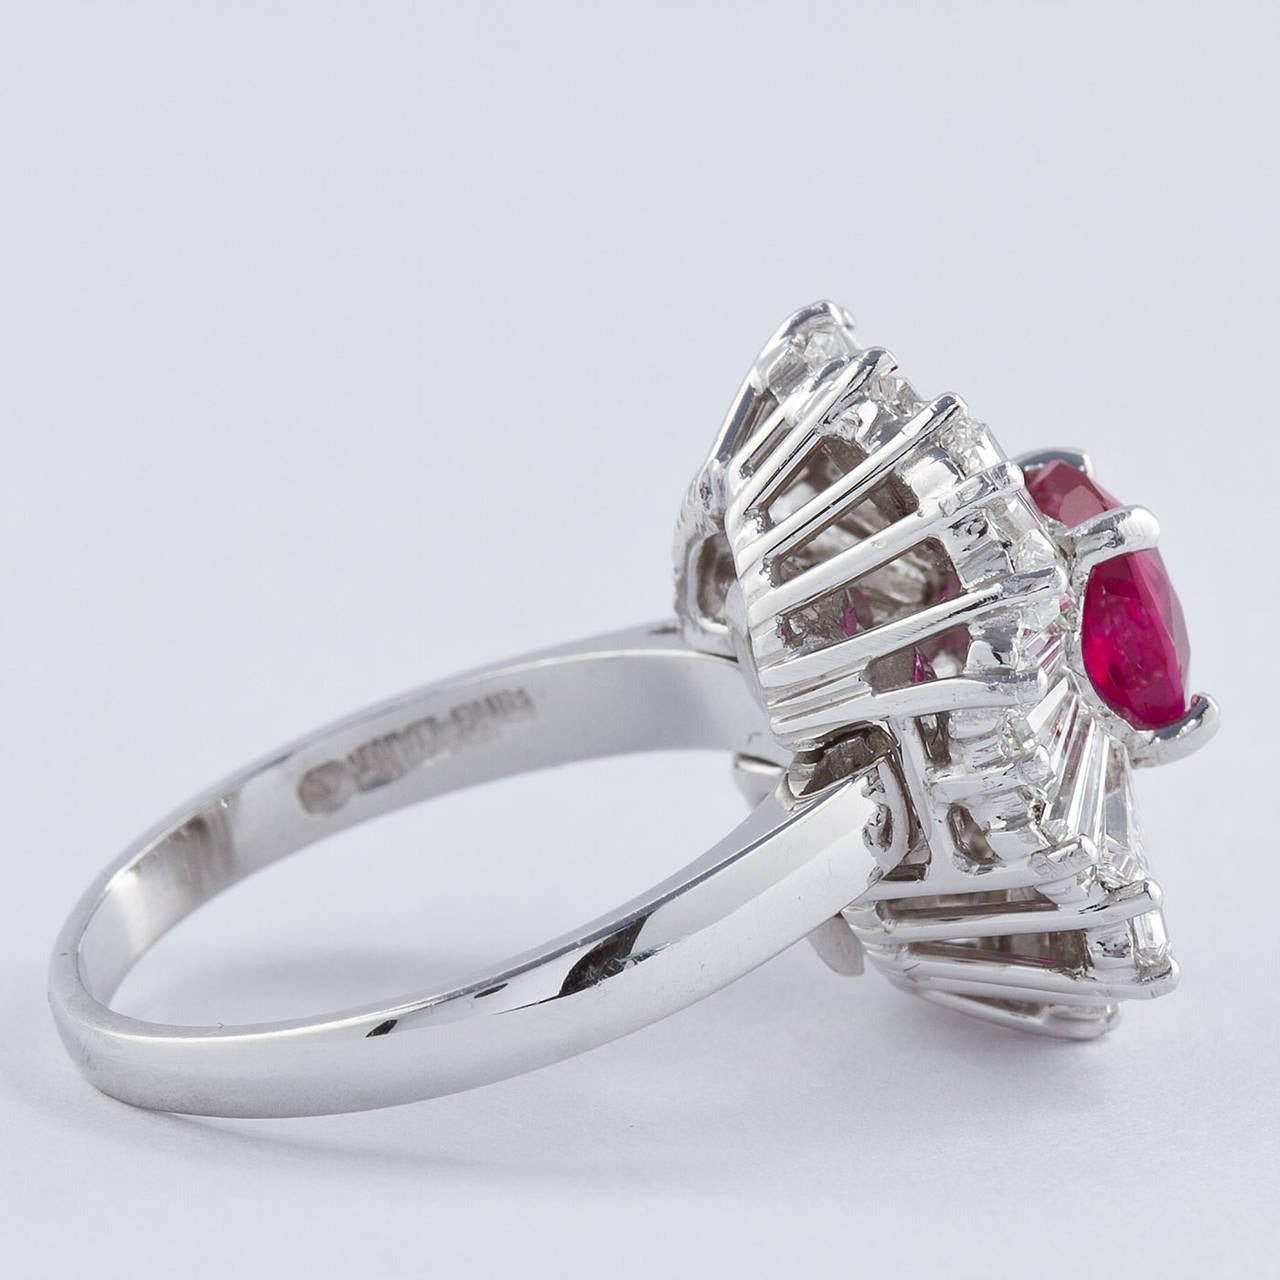 Women's Cushion Cut Ruby Diamond Ballerina Ring 1.86 Carat  For Sale